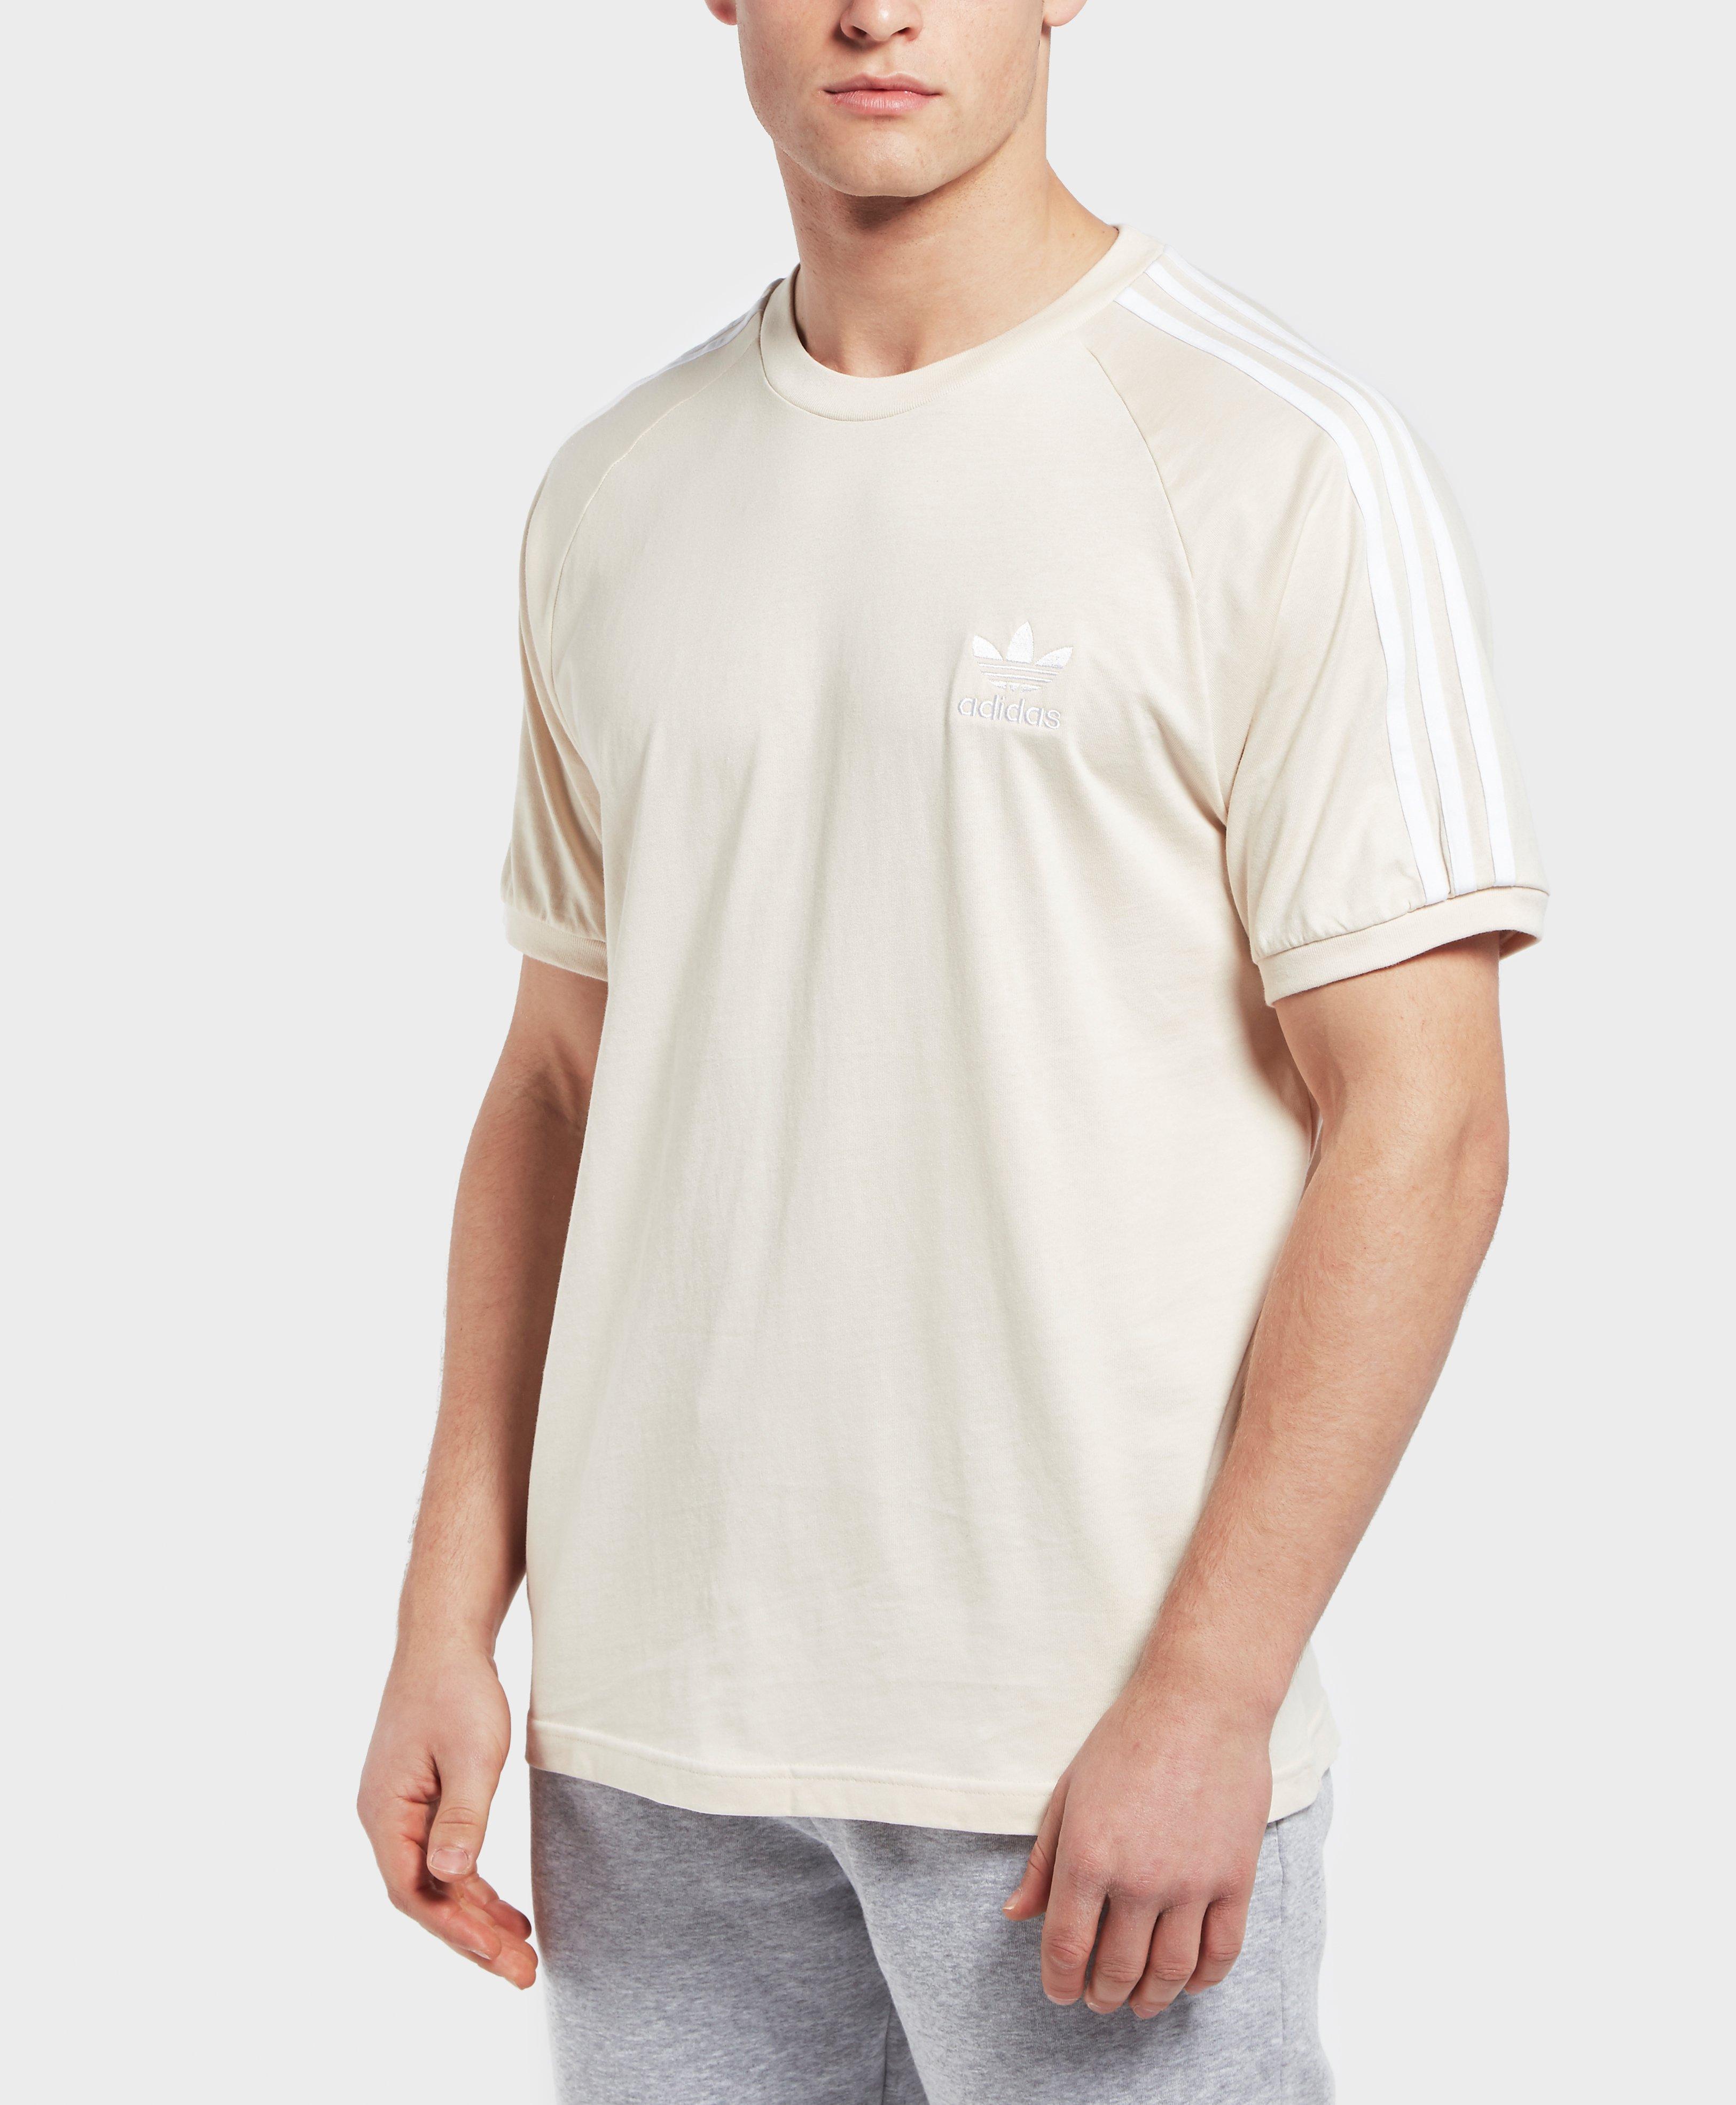 Lyst adidas originali in california a maniche corte t - shirt per gli uomini.